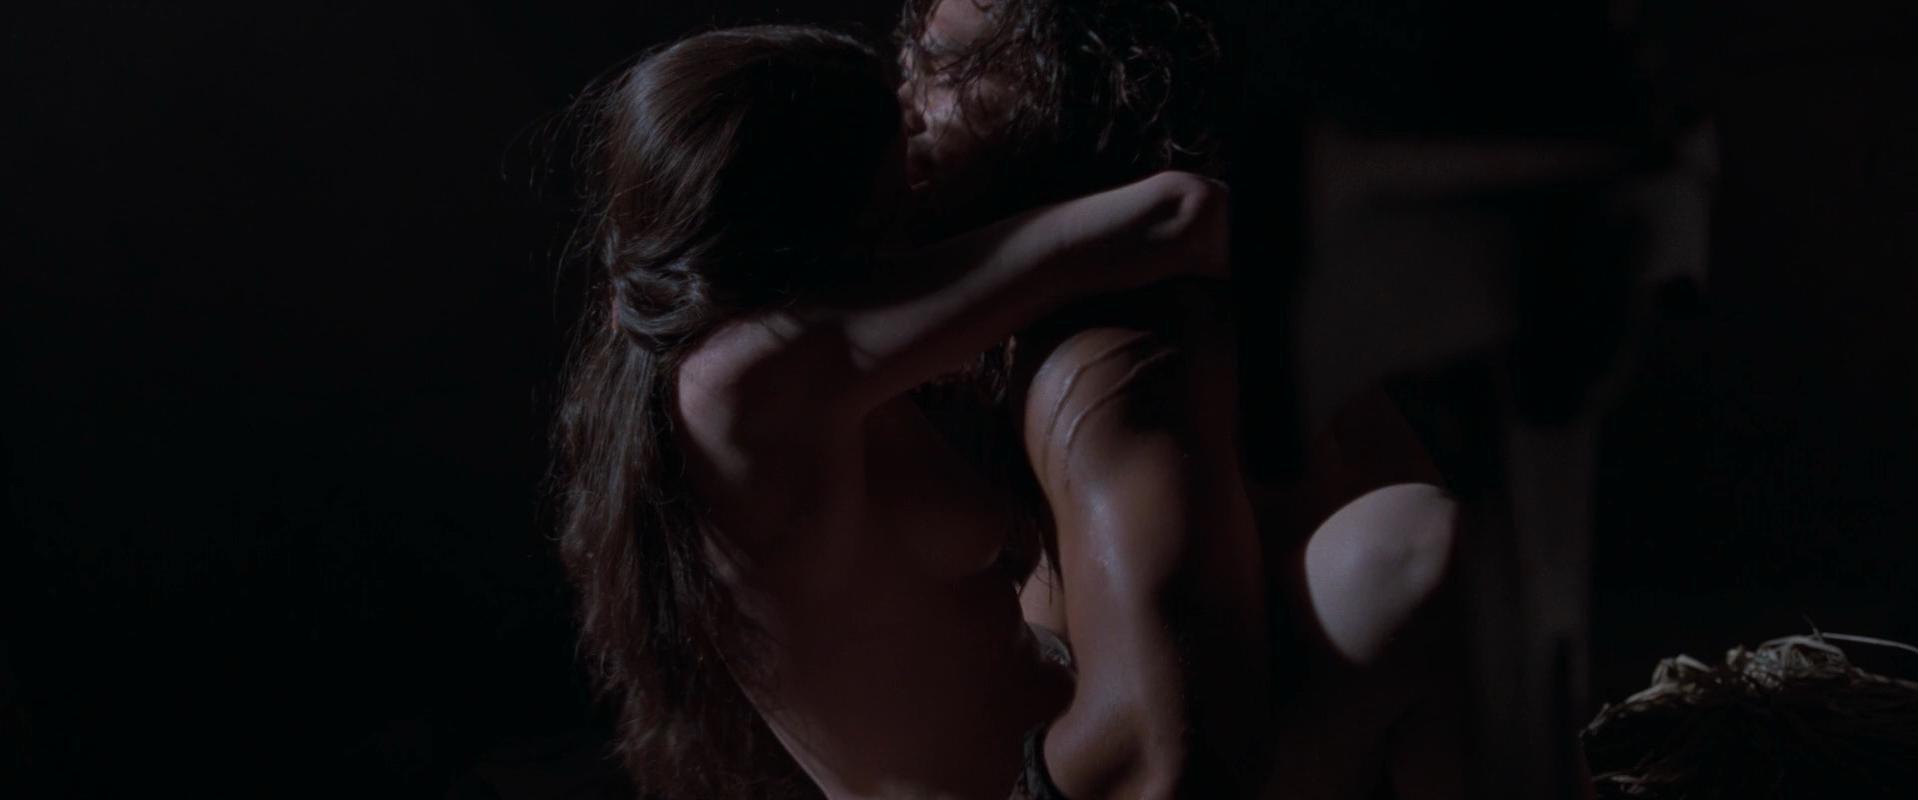 Nude rachel nichols sex scene